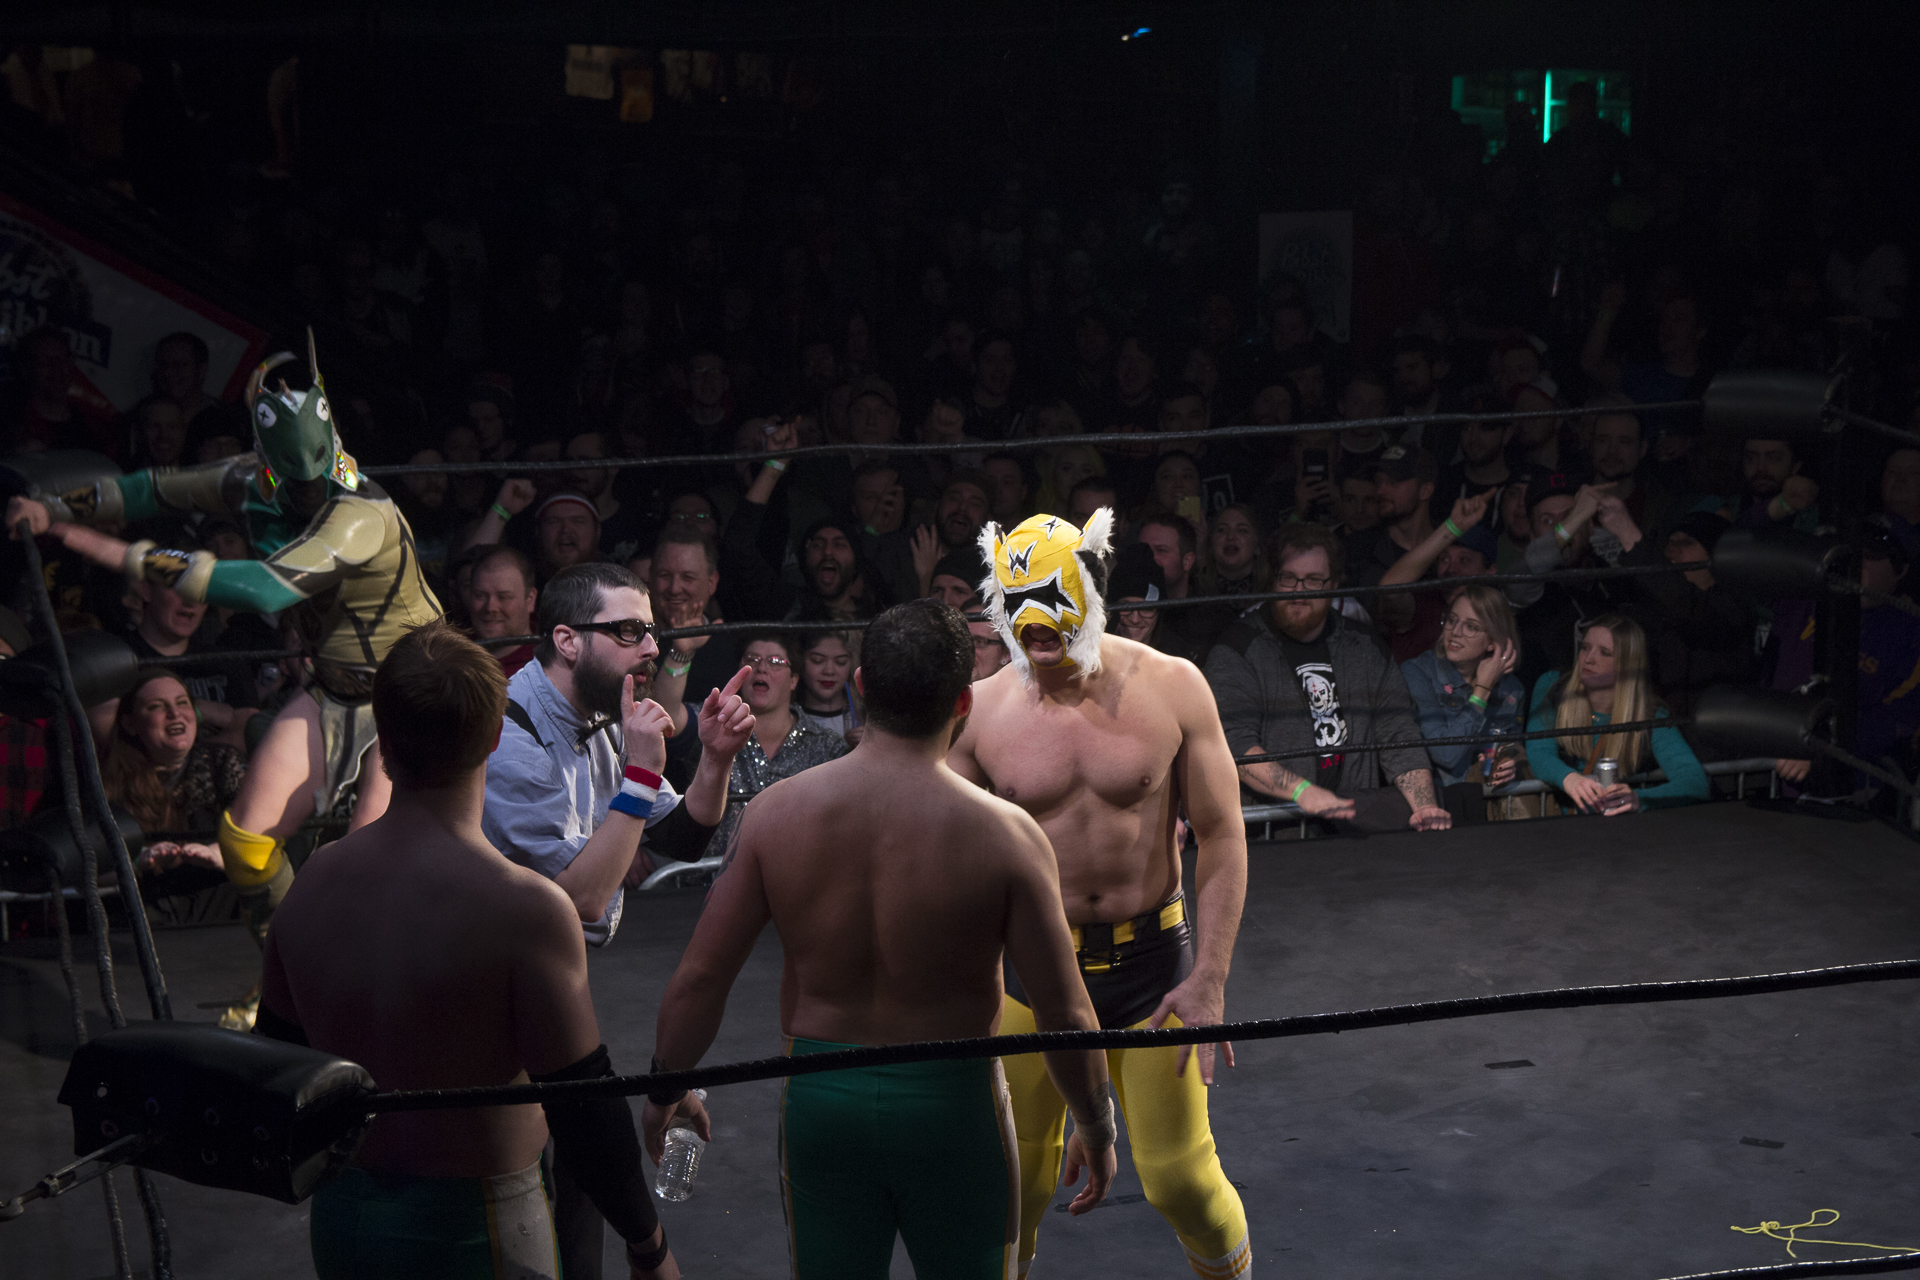 wrestlepalooza-wrestling-16.jpg